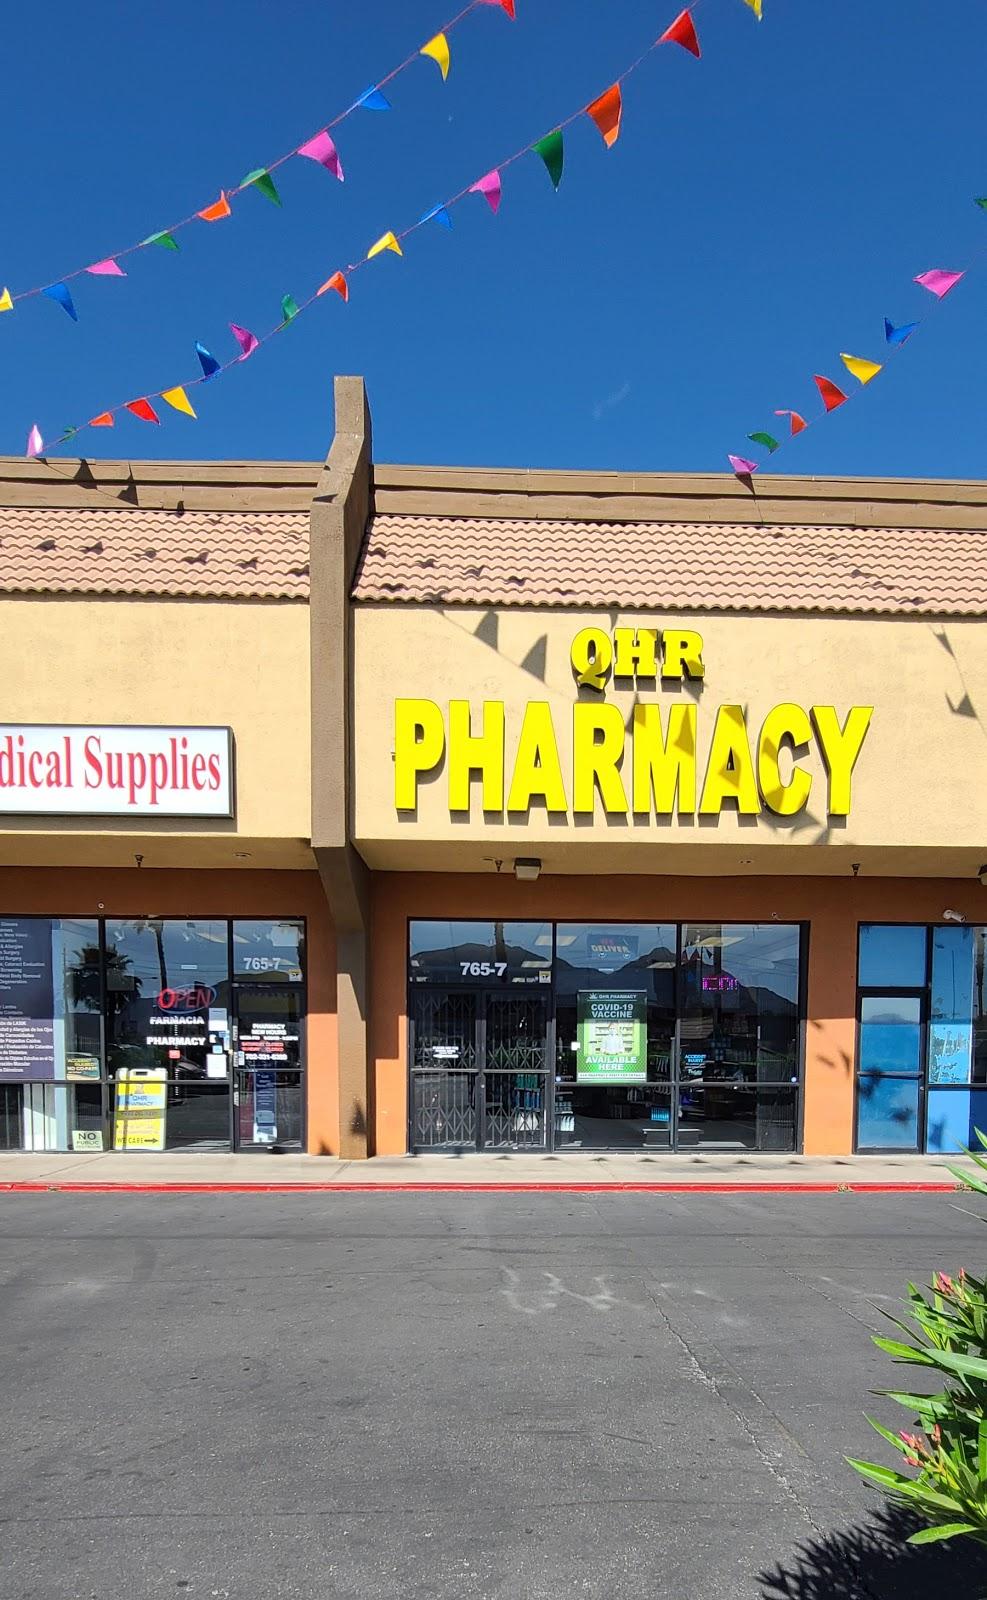 QHR Pharmacy - pharmacy    Photo 3 of 5   Address: 765 N Nellis Blvd #7, Las Vegas, NV 89110, USA   Phone: (702) 331-6388